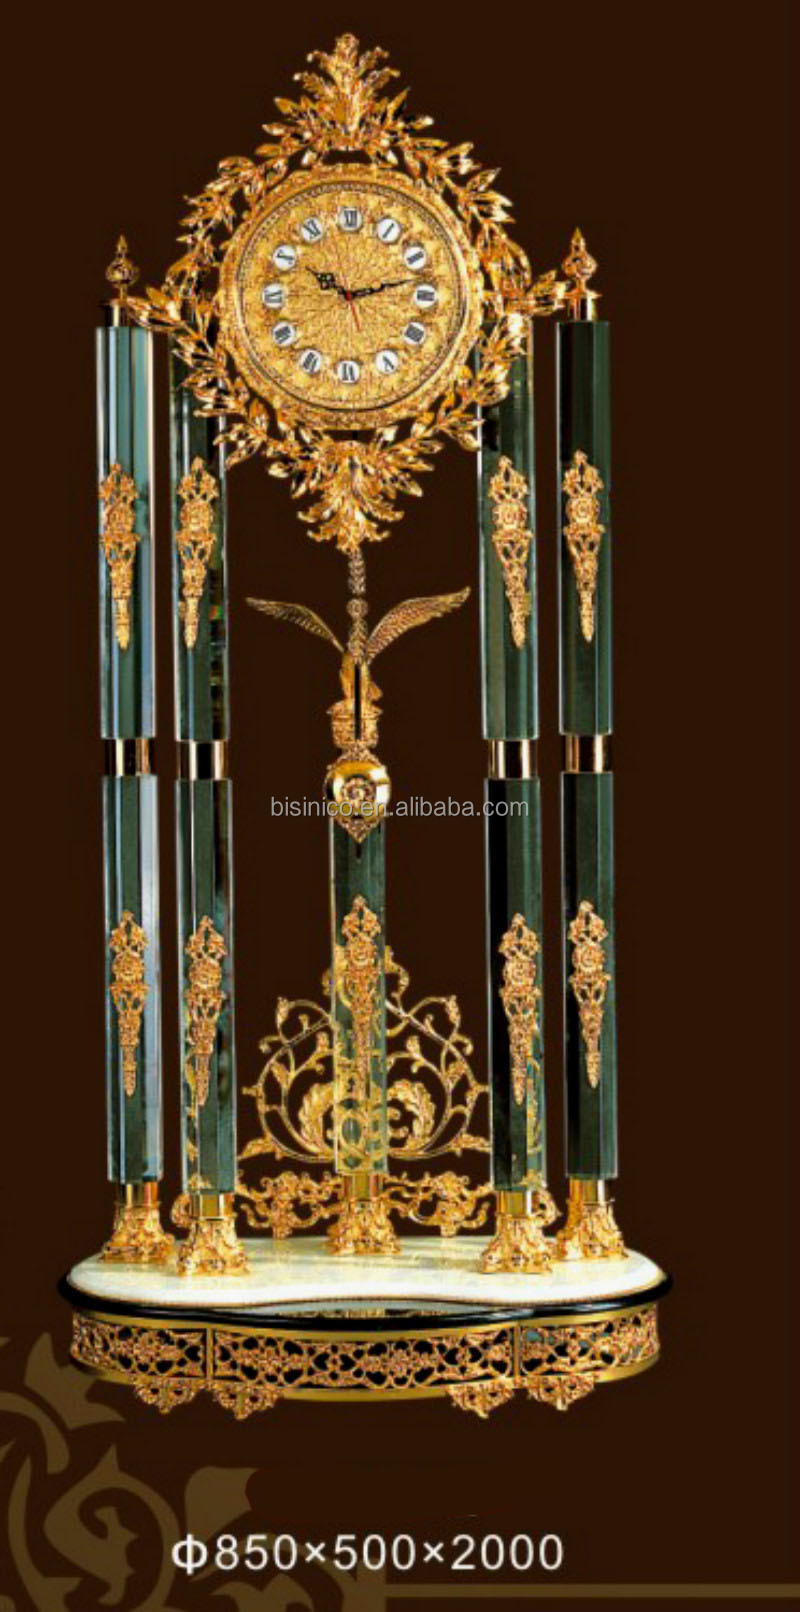 Bisini Luxury Crystal Brass Clock Living Room Luxury Clock